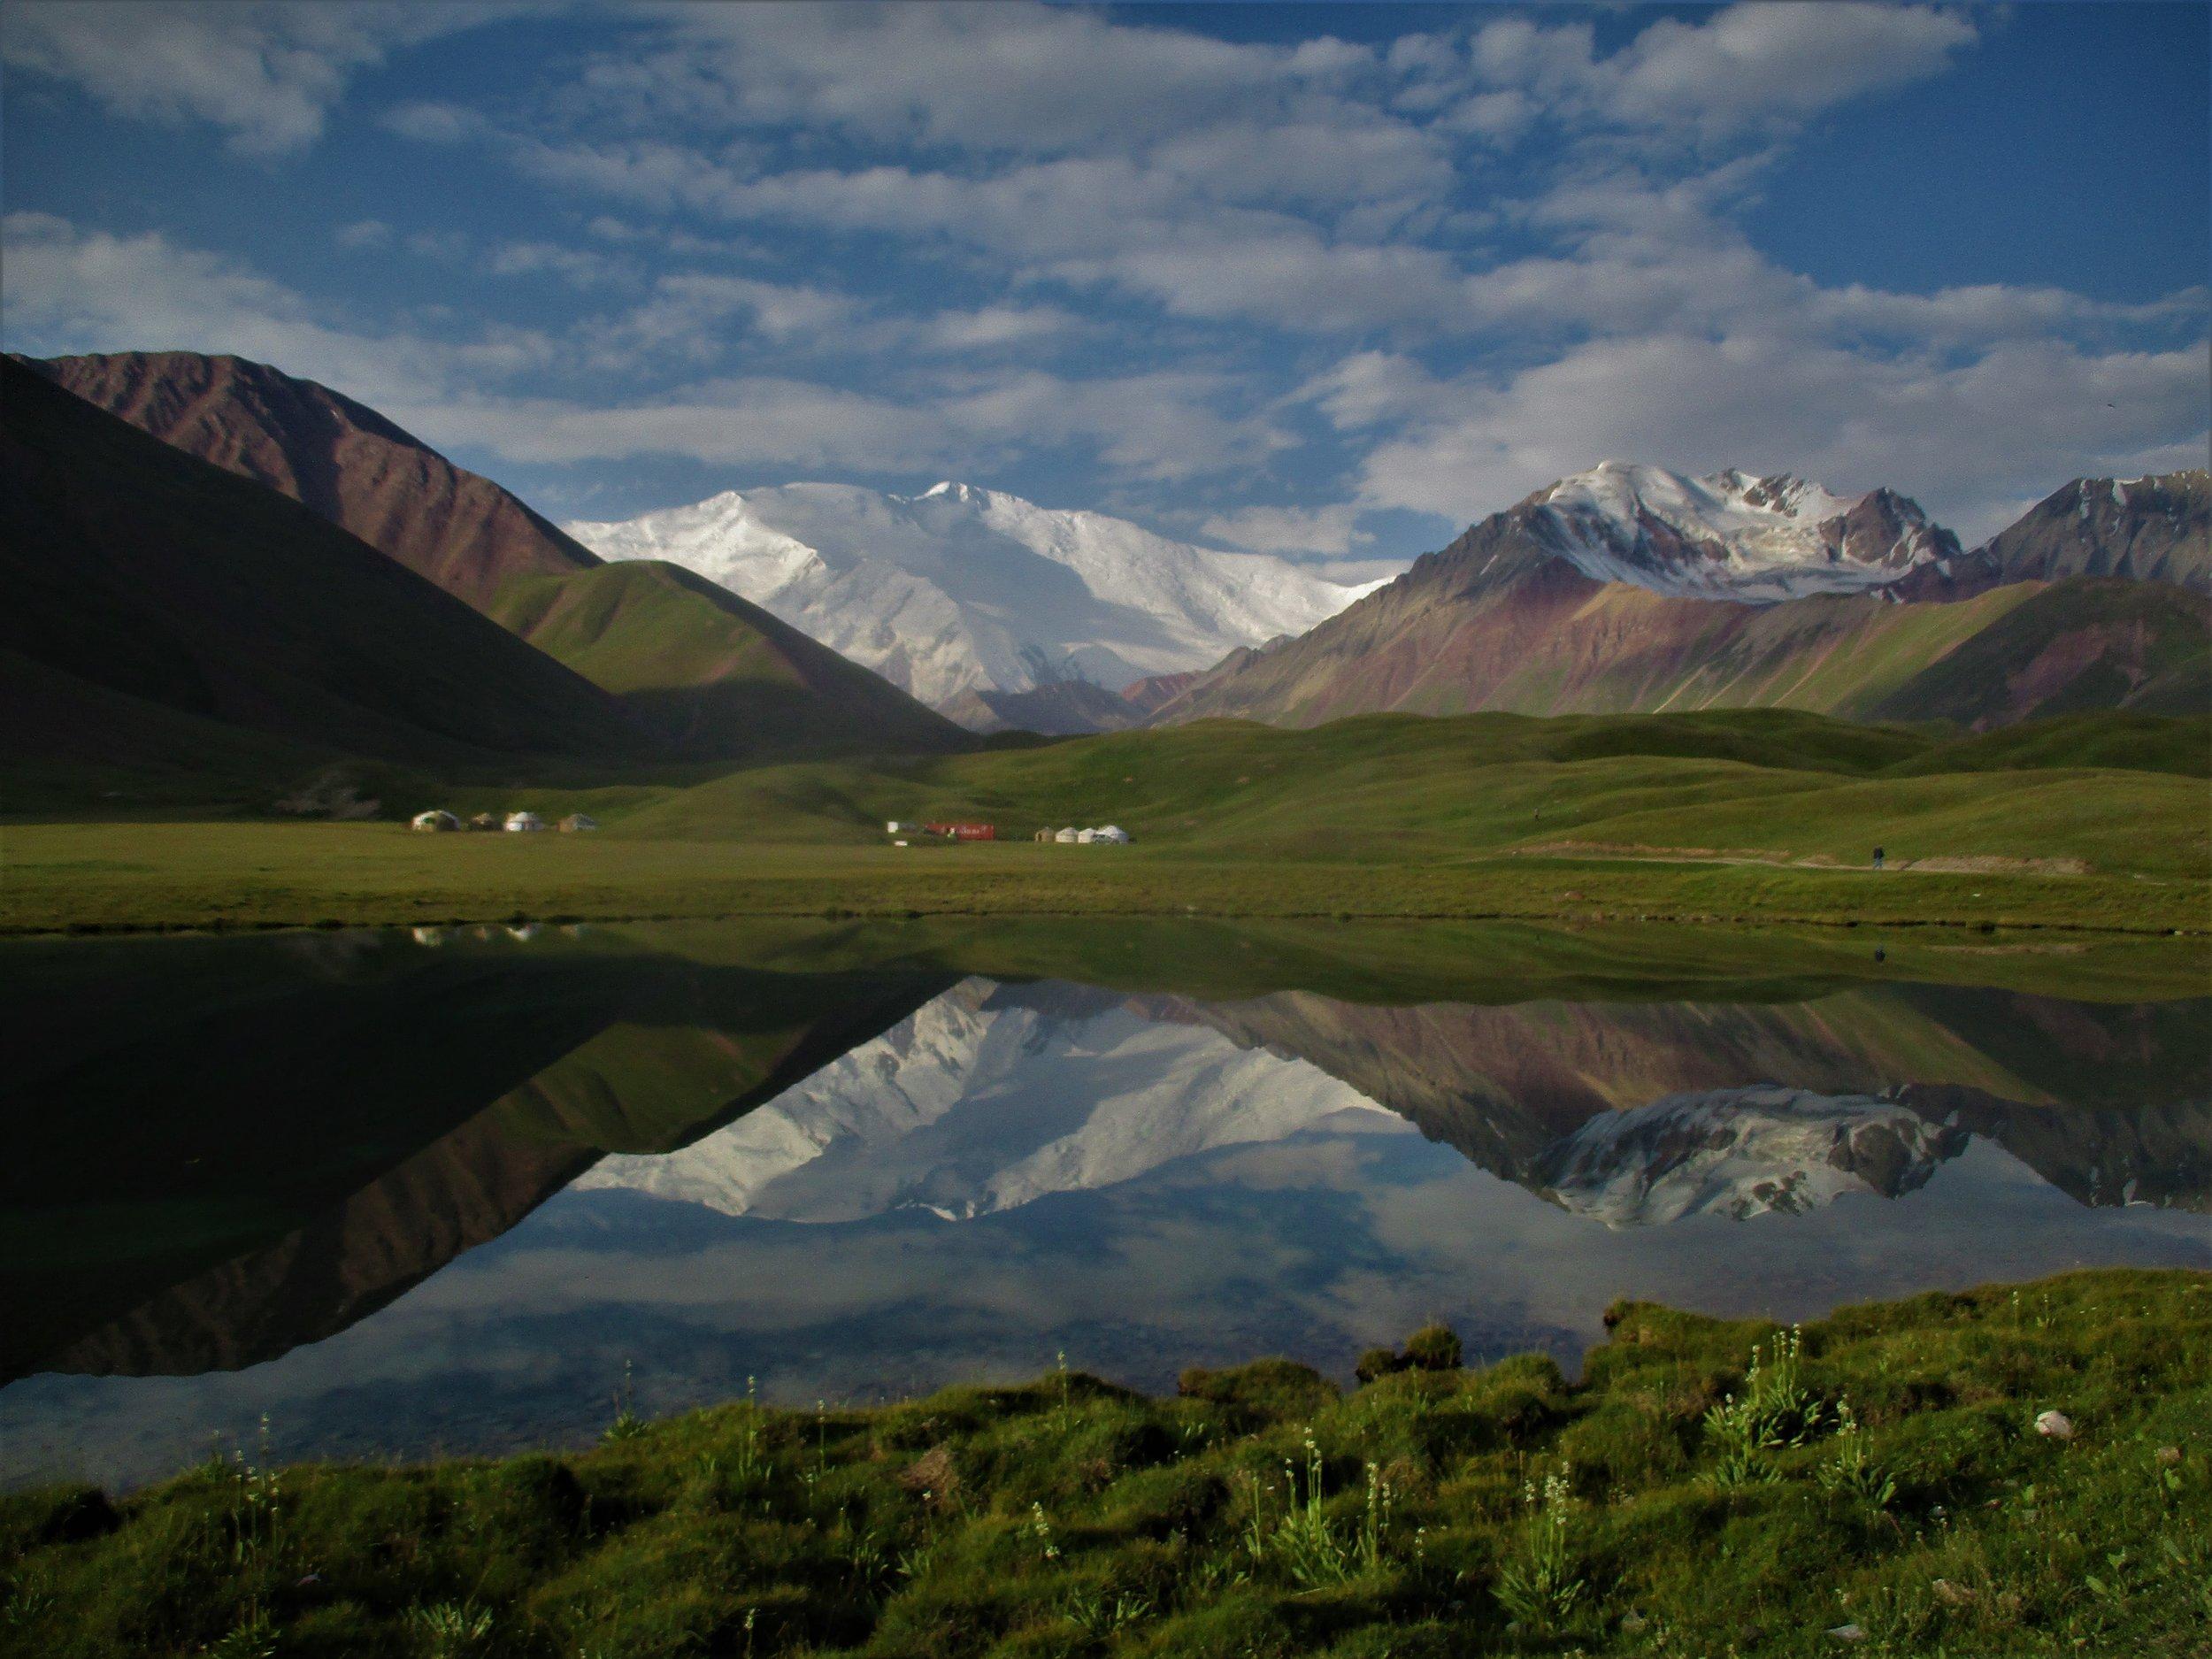 Peak Lenin rises above Tuplar Kul Lake at dawn